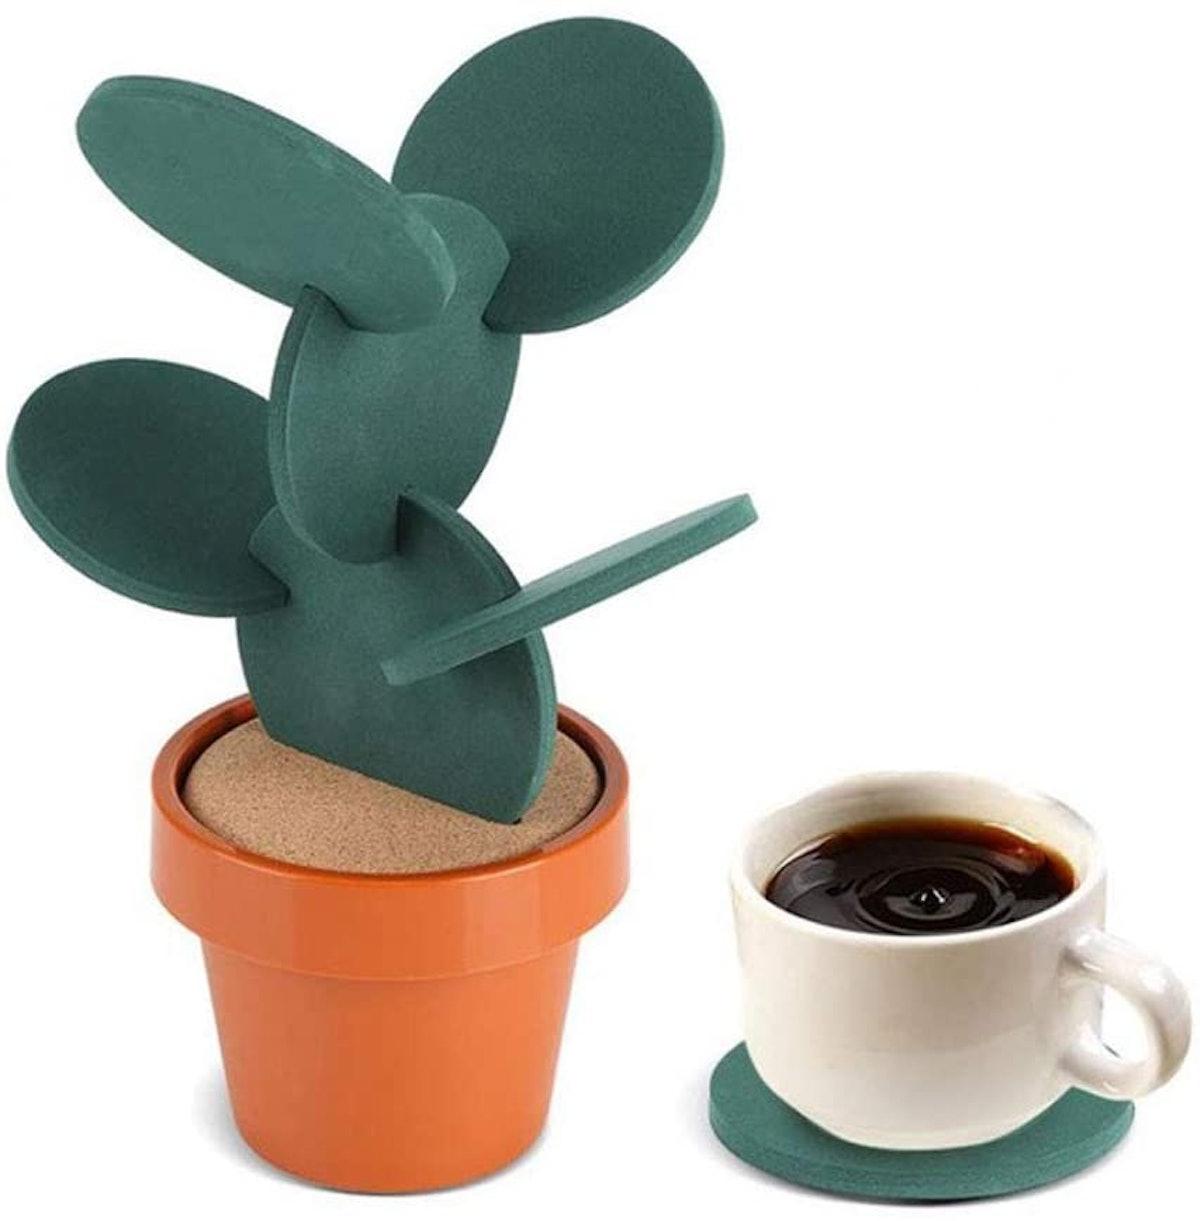 Buery Cactus Coasters